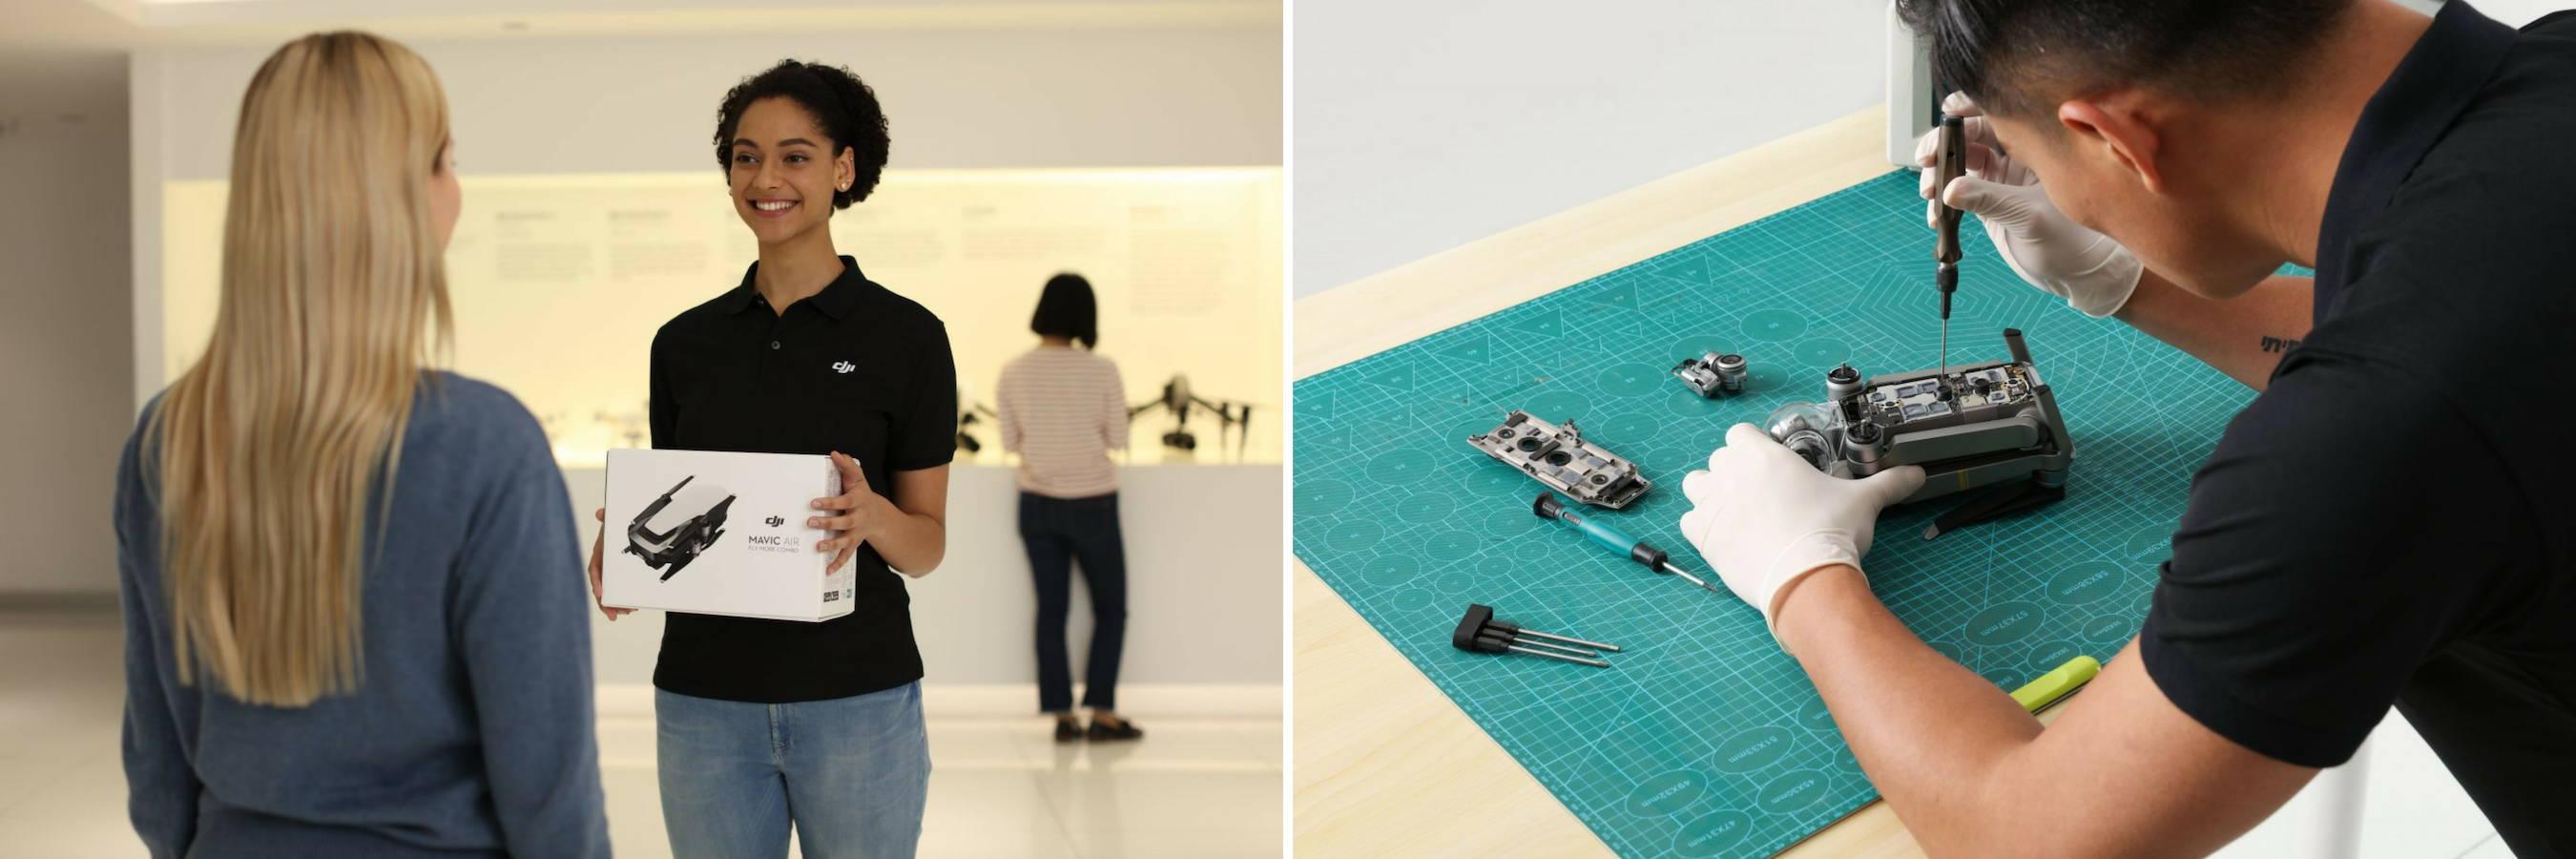 dr drone repair services | dji drones canada